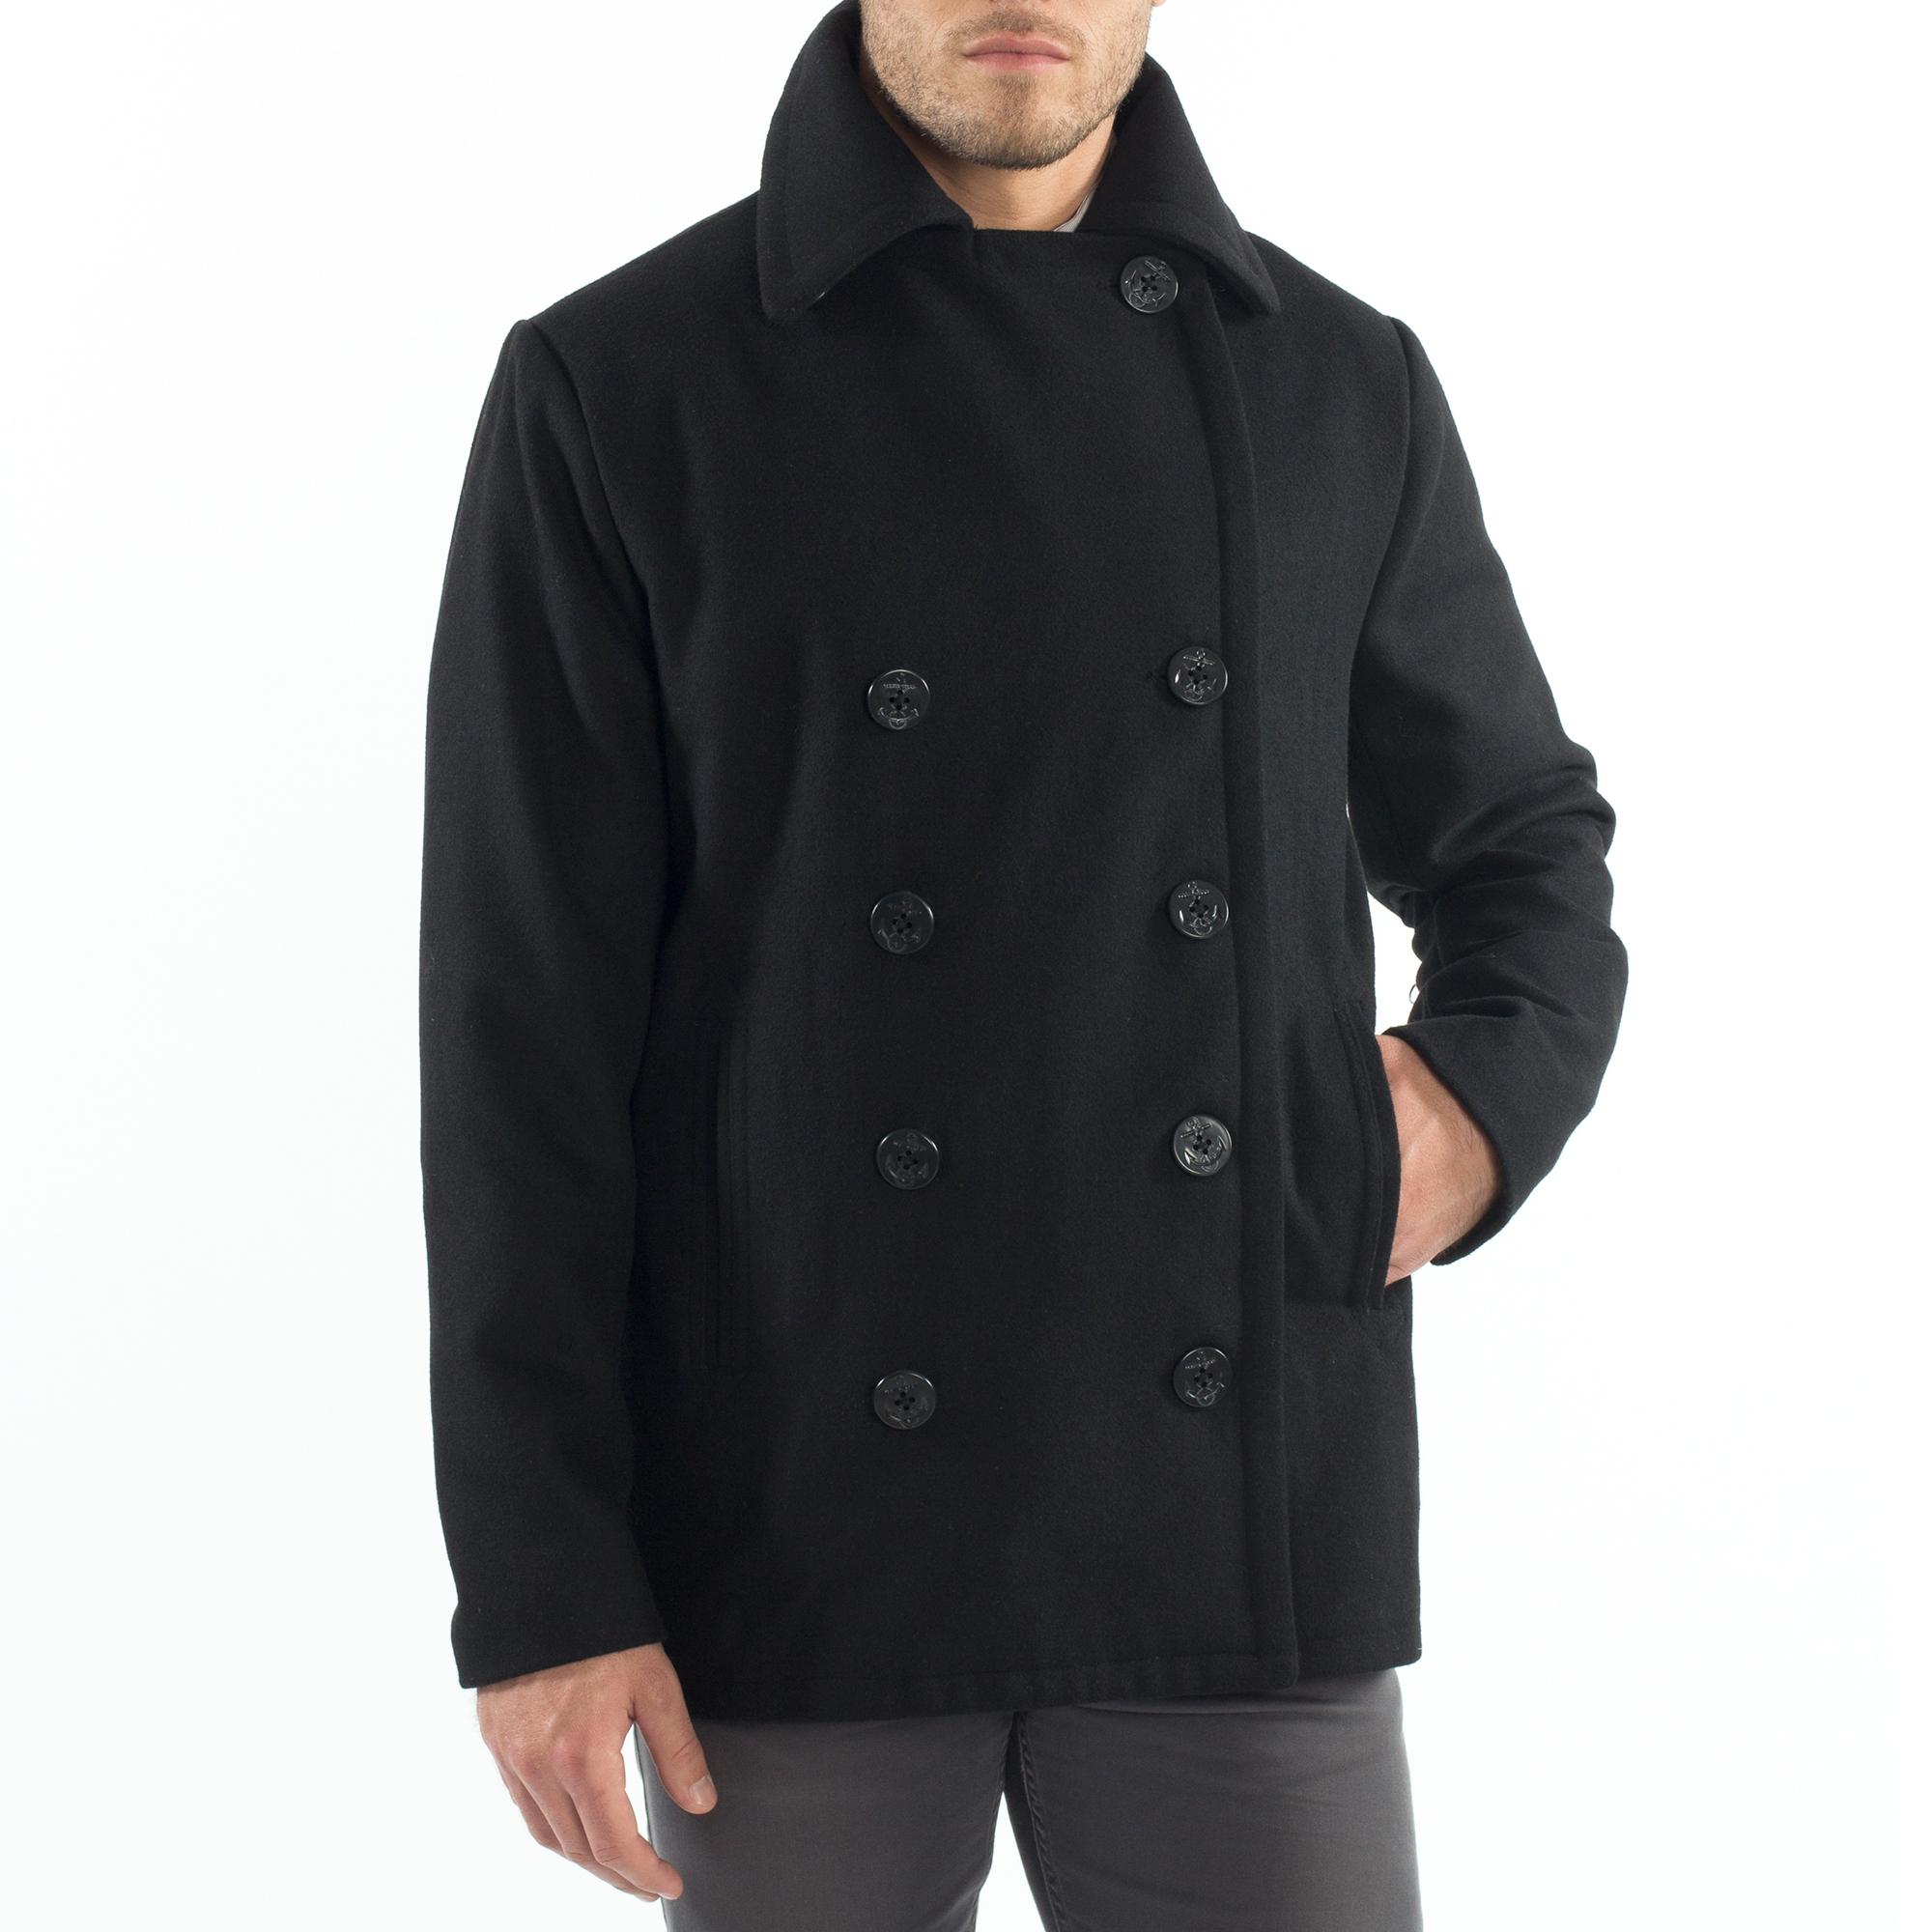 Alpine-Swiss-Mason-Mens-Wool-Blend-Pea-Coat-Jacket-Double-Breasted-Dress-Coat thumbnail 17